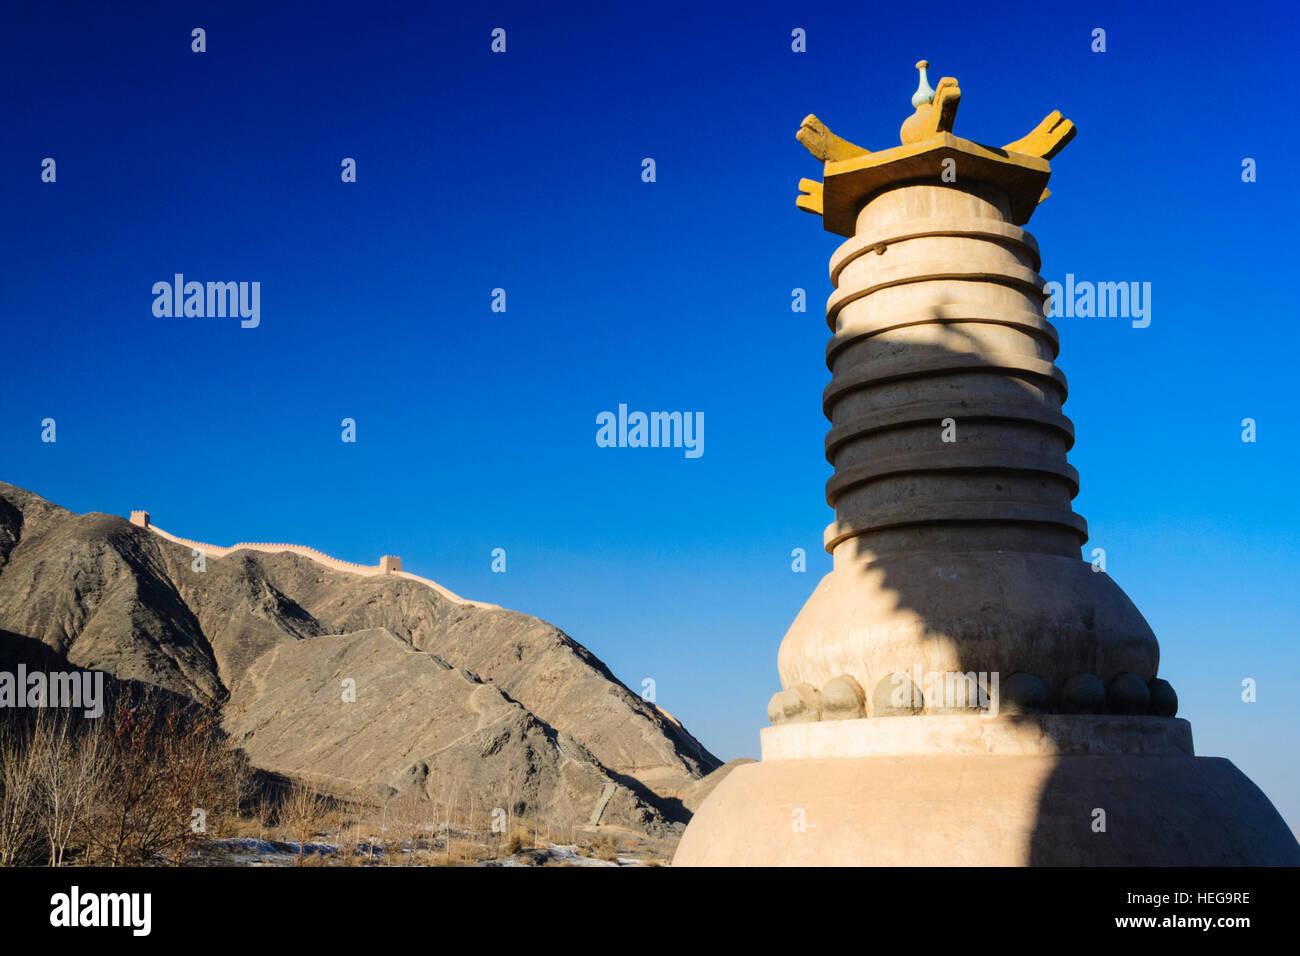 Buddhist stupa at the western confine of the Great Wall at Jiayuguan, Gansu province, China, Asia - Stock Image